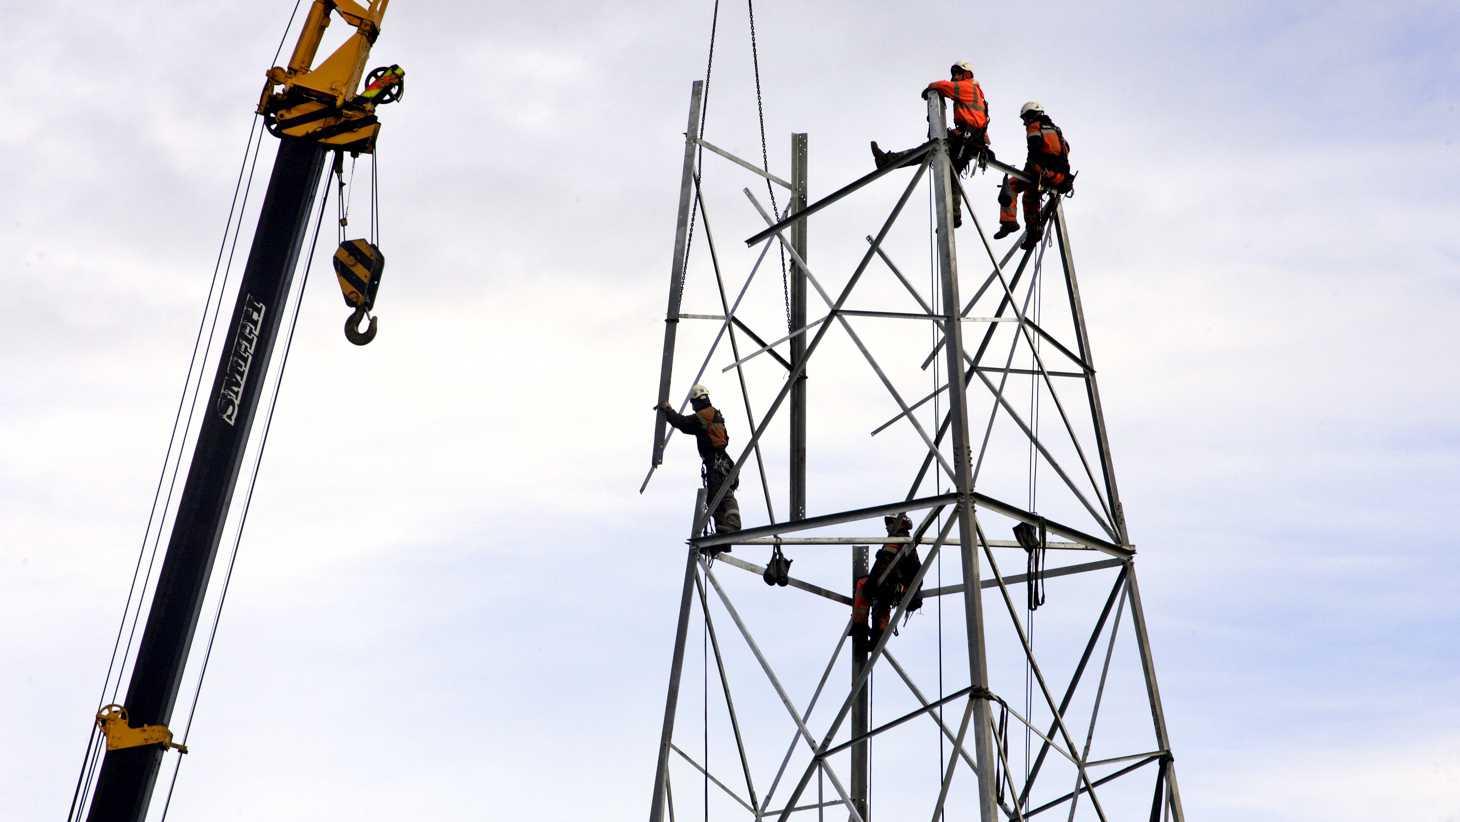 woosh-telecom-Tower-Construction-3